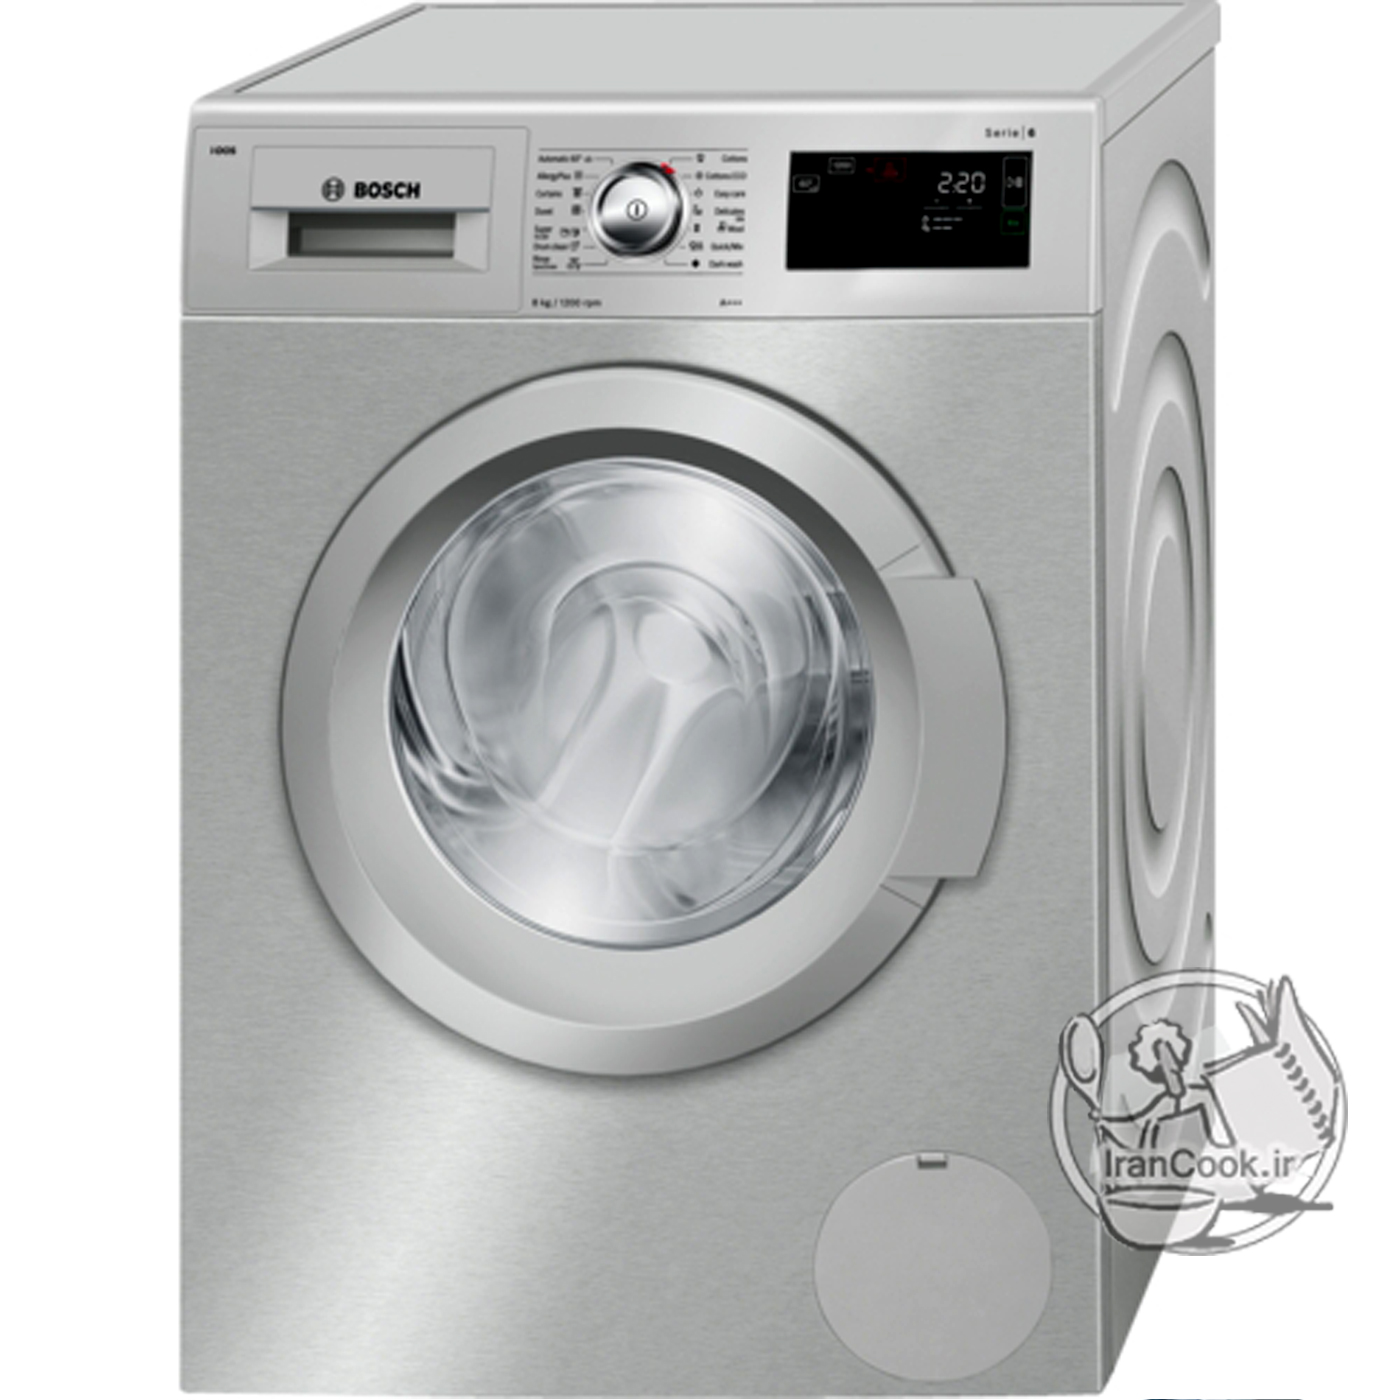 ماشین لباسشویی بوش مدل WAT2466XIR